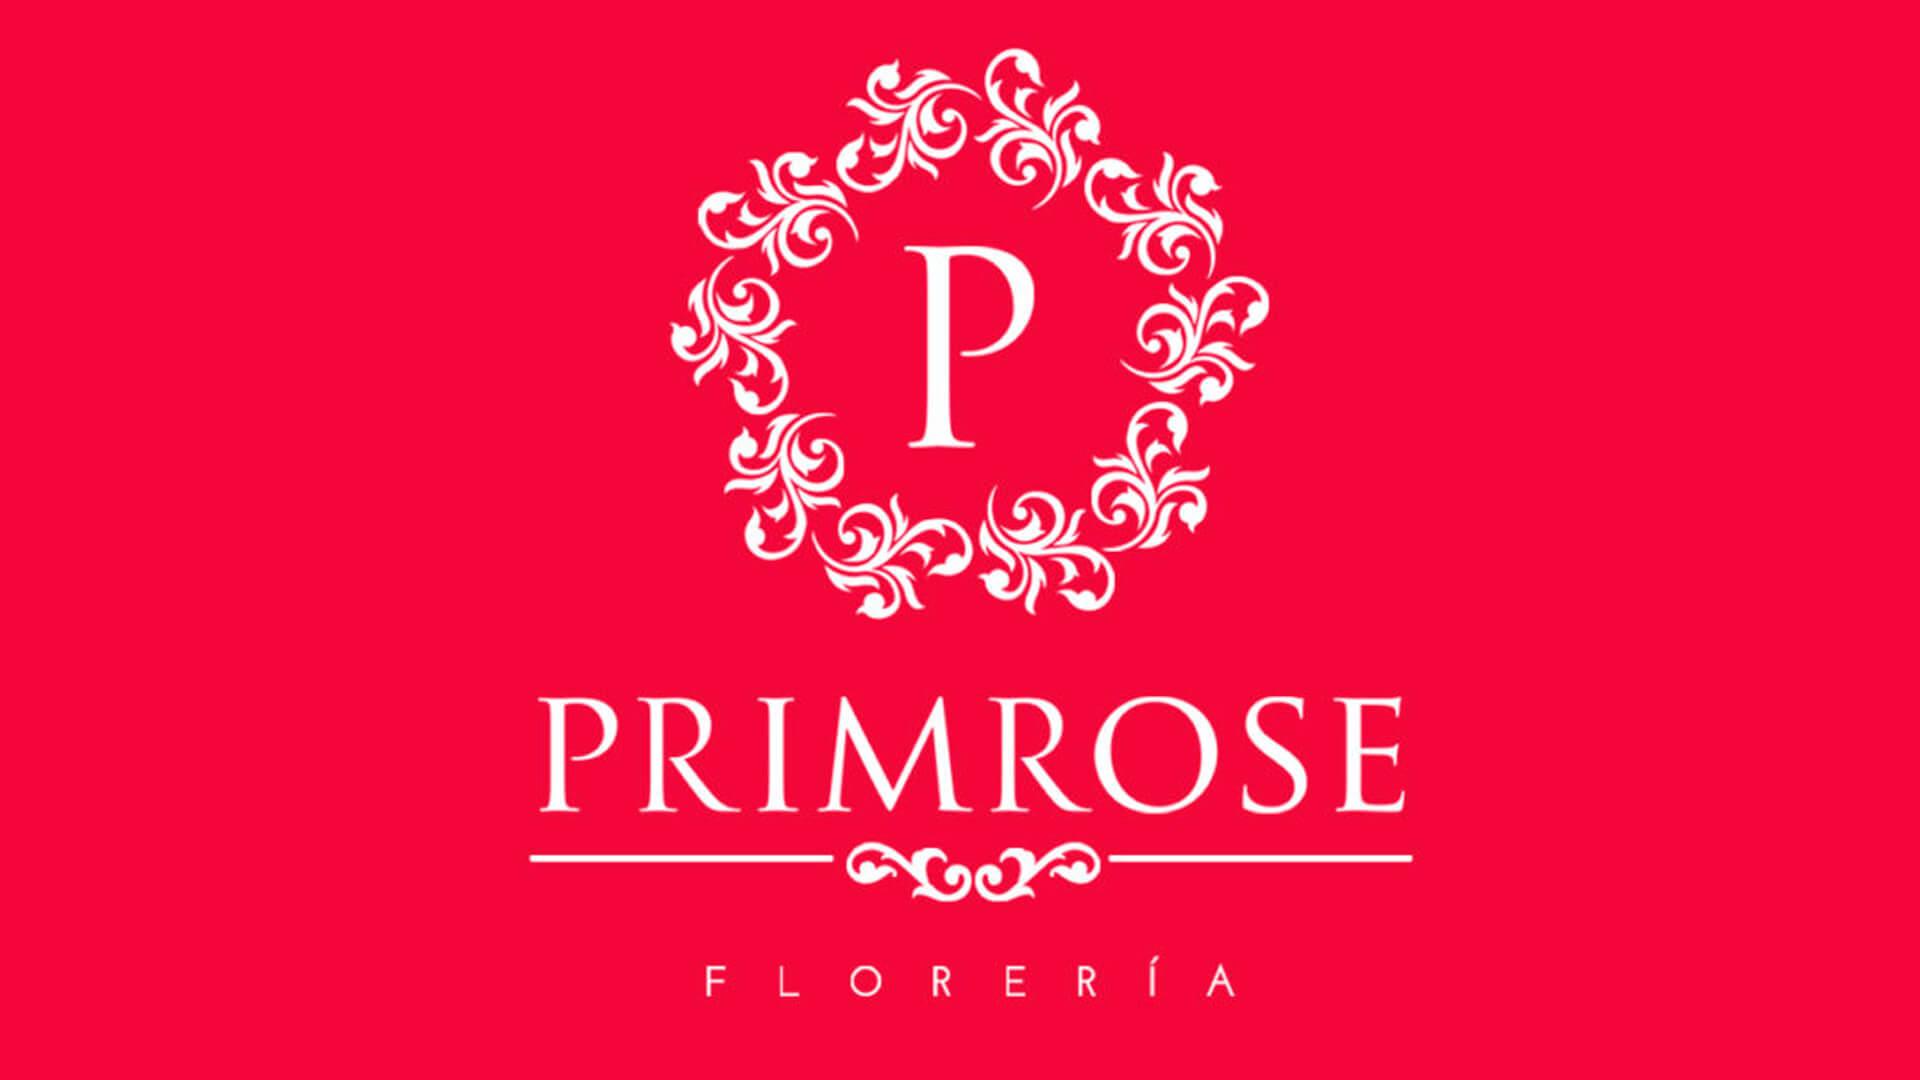 desarrollo-web-de-floreria-primrose-peru